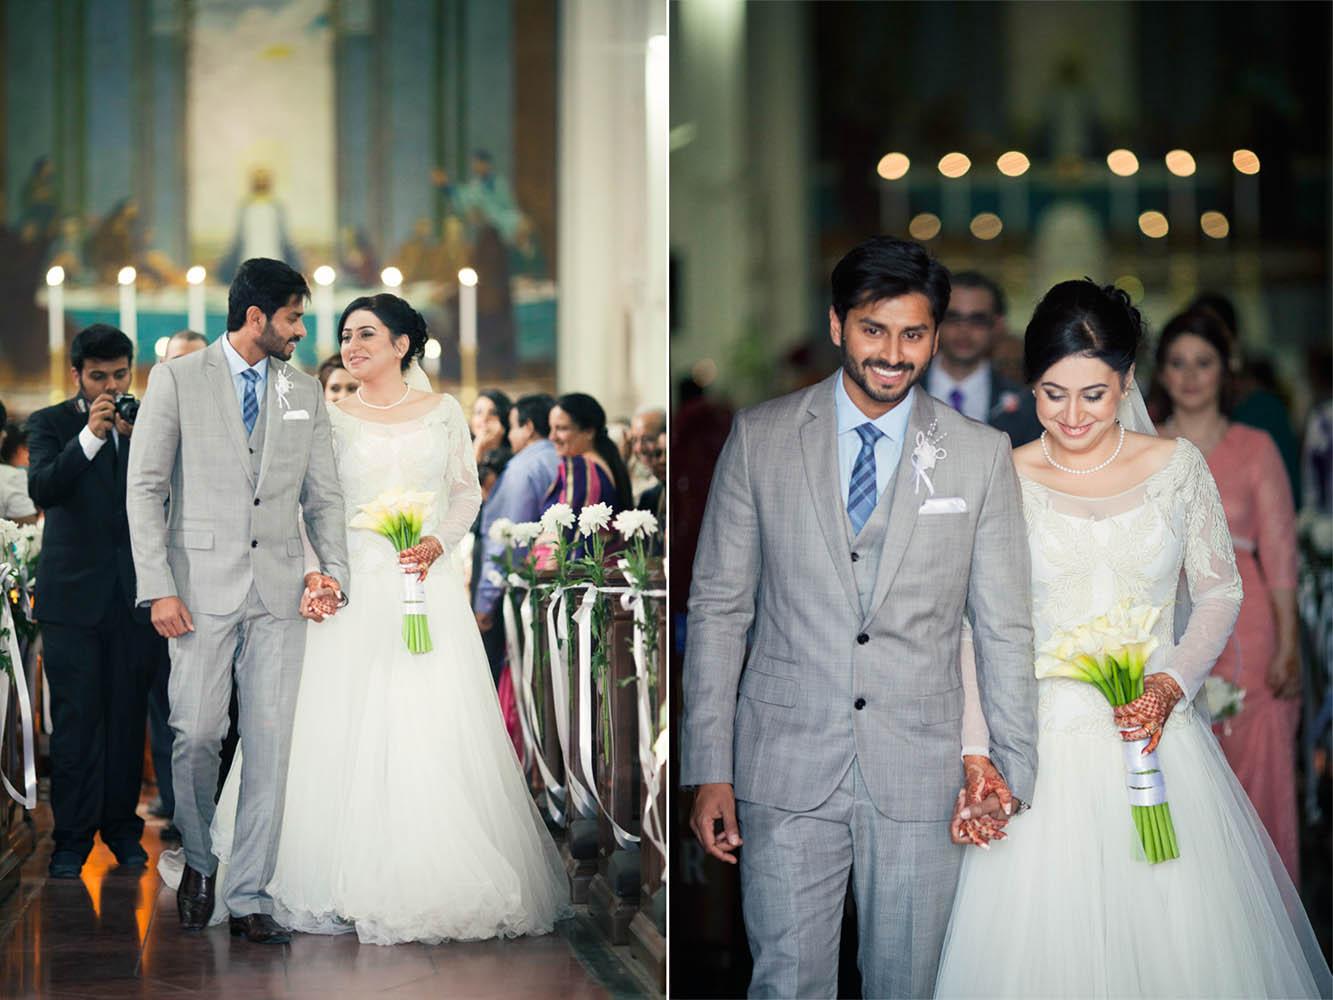 christian-wedding-8.jpg